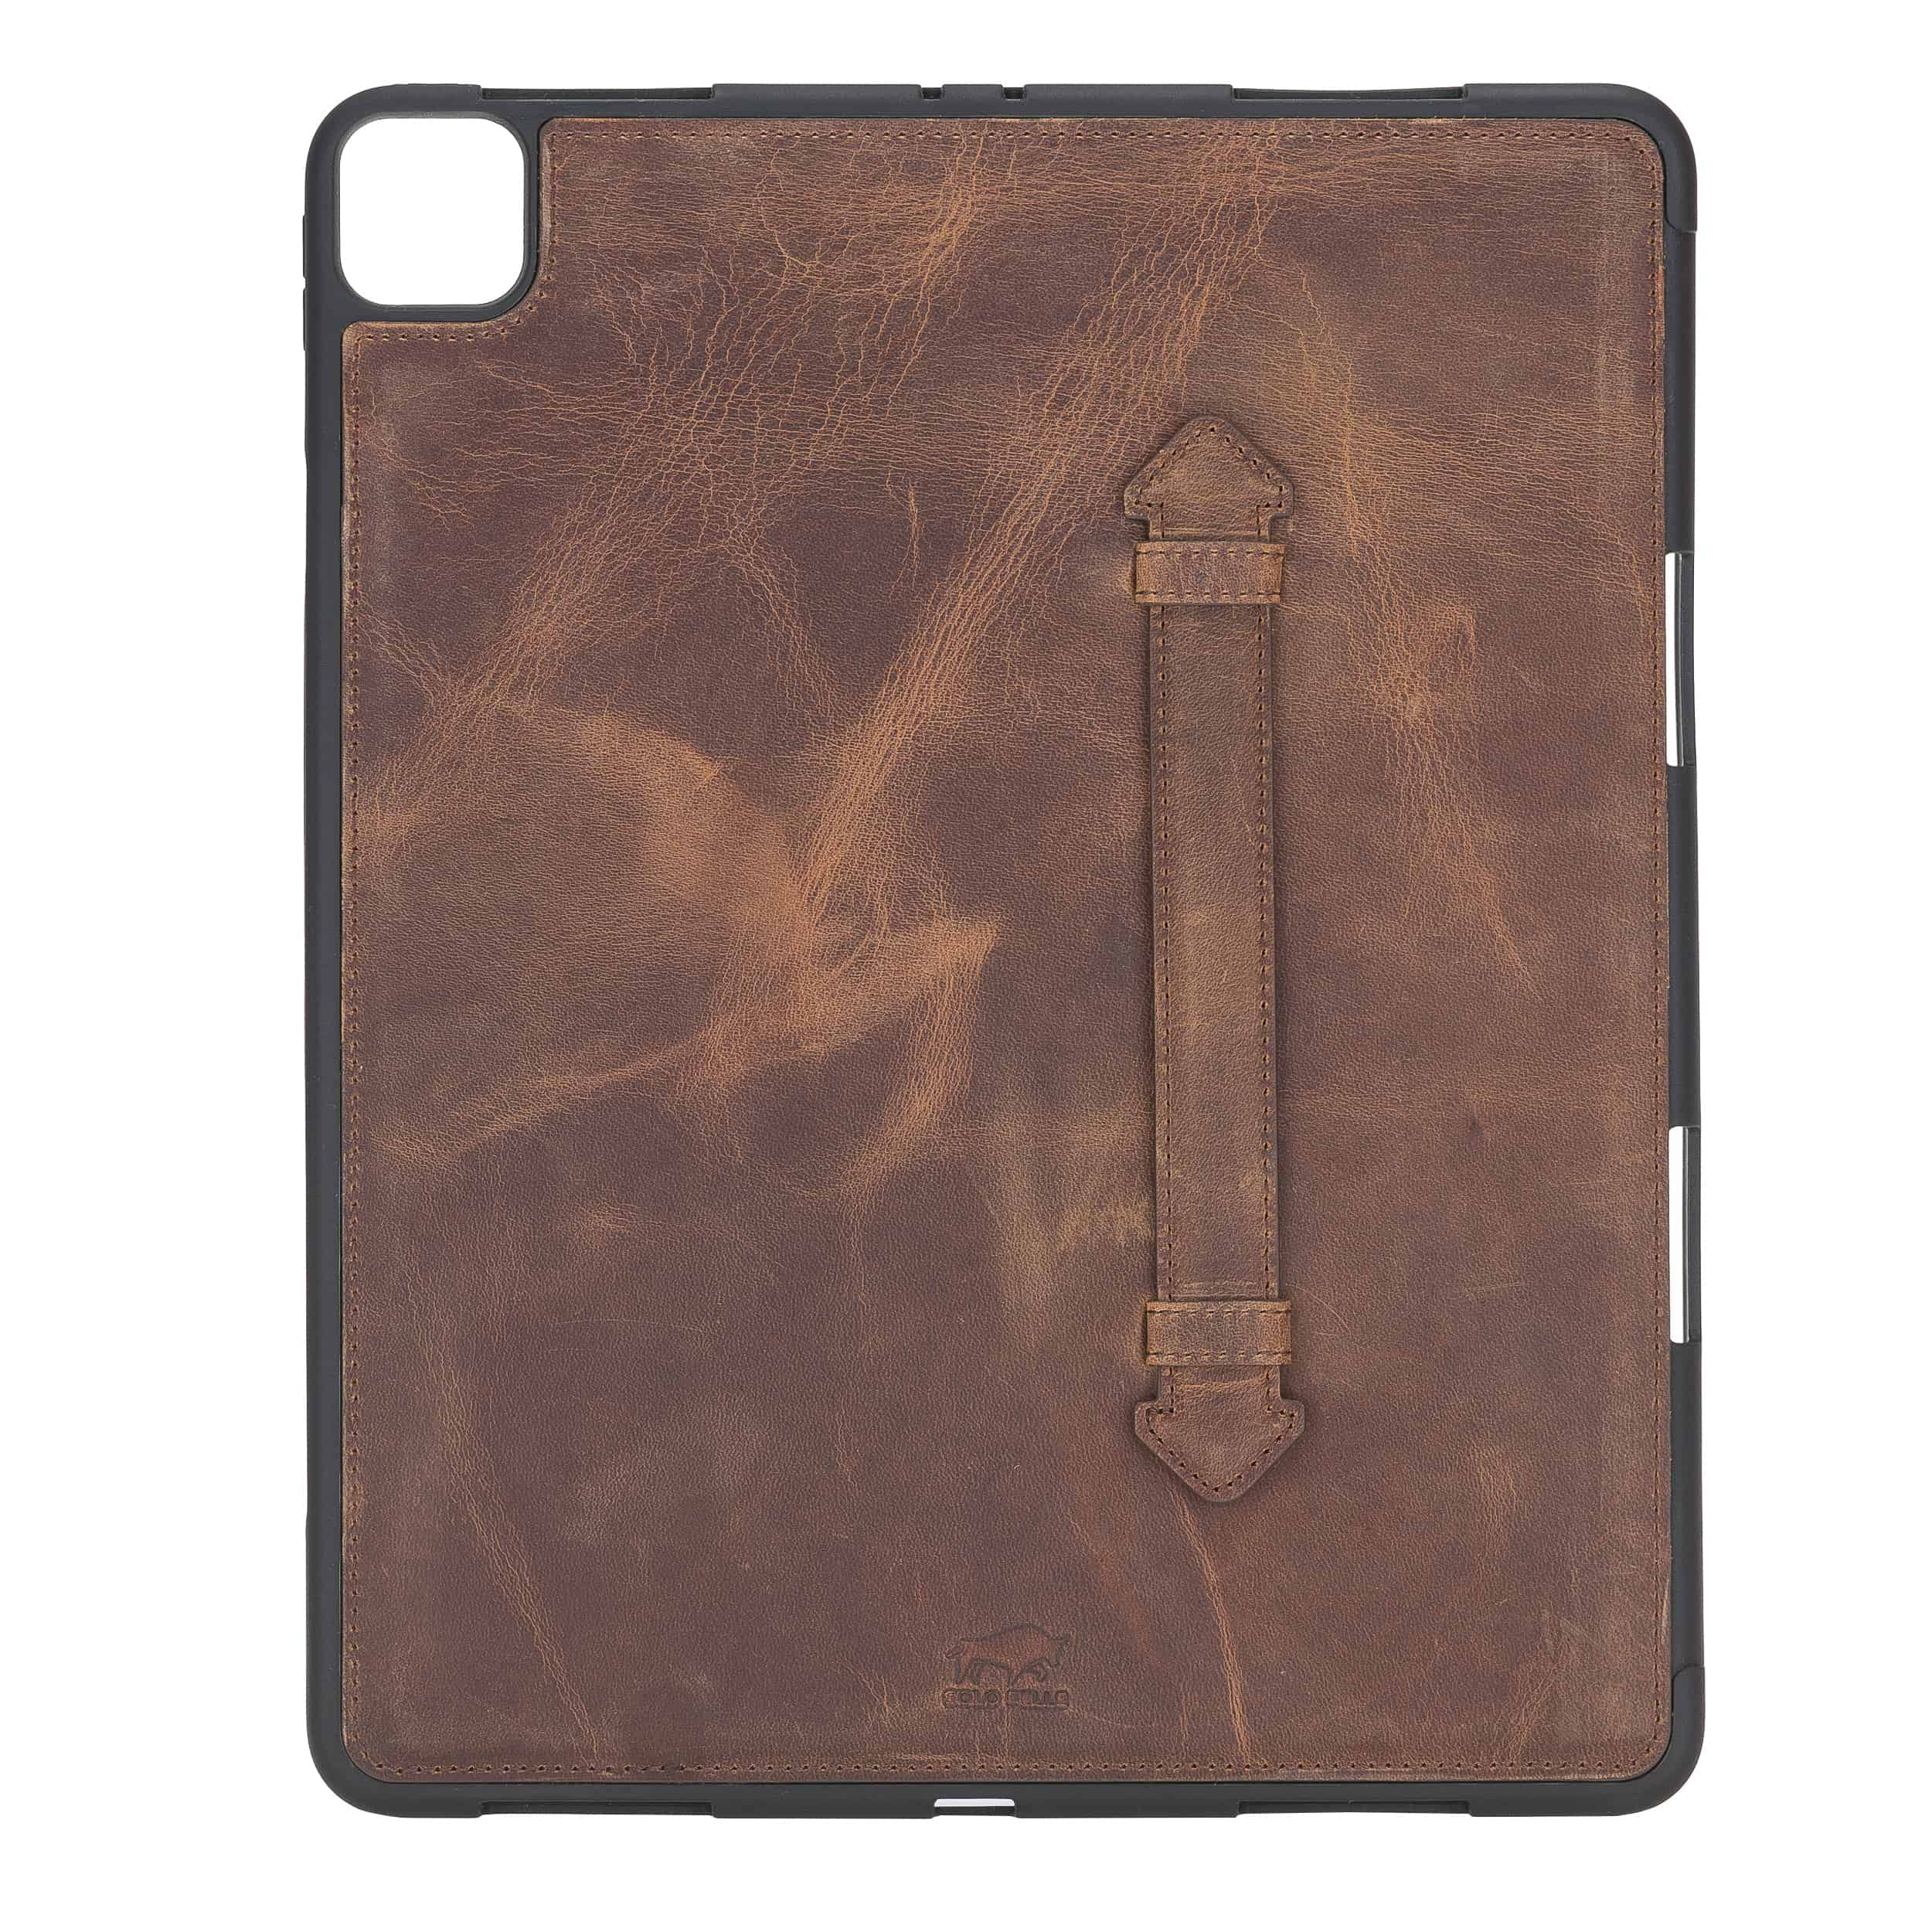 "Solo Pelle Hülle geeignet für Apple iPad Pro 12,9"" 2020 Echtleder Case aus echtem Leder. Unterstützt Pencil inkl. Ledergriff (Vintage Braun)"